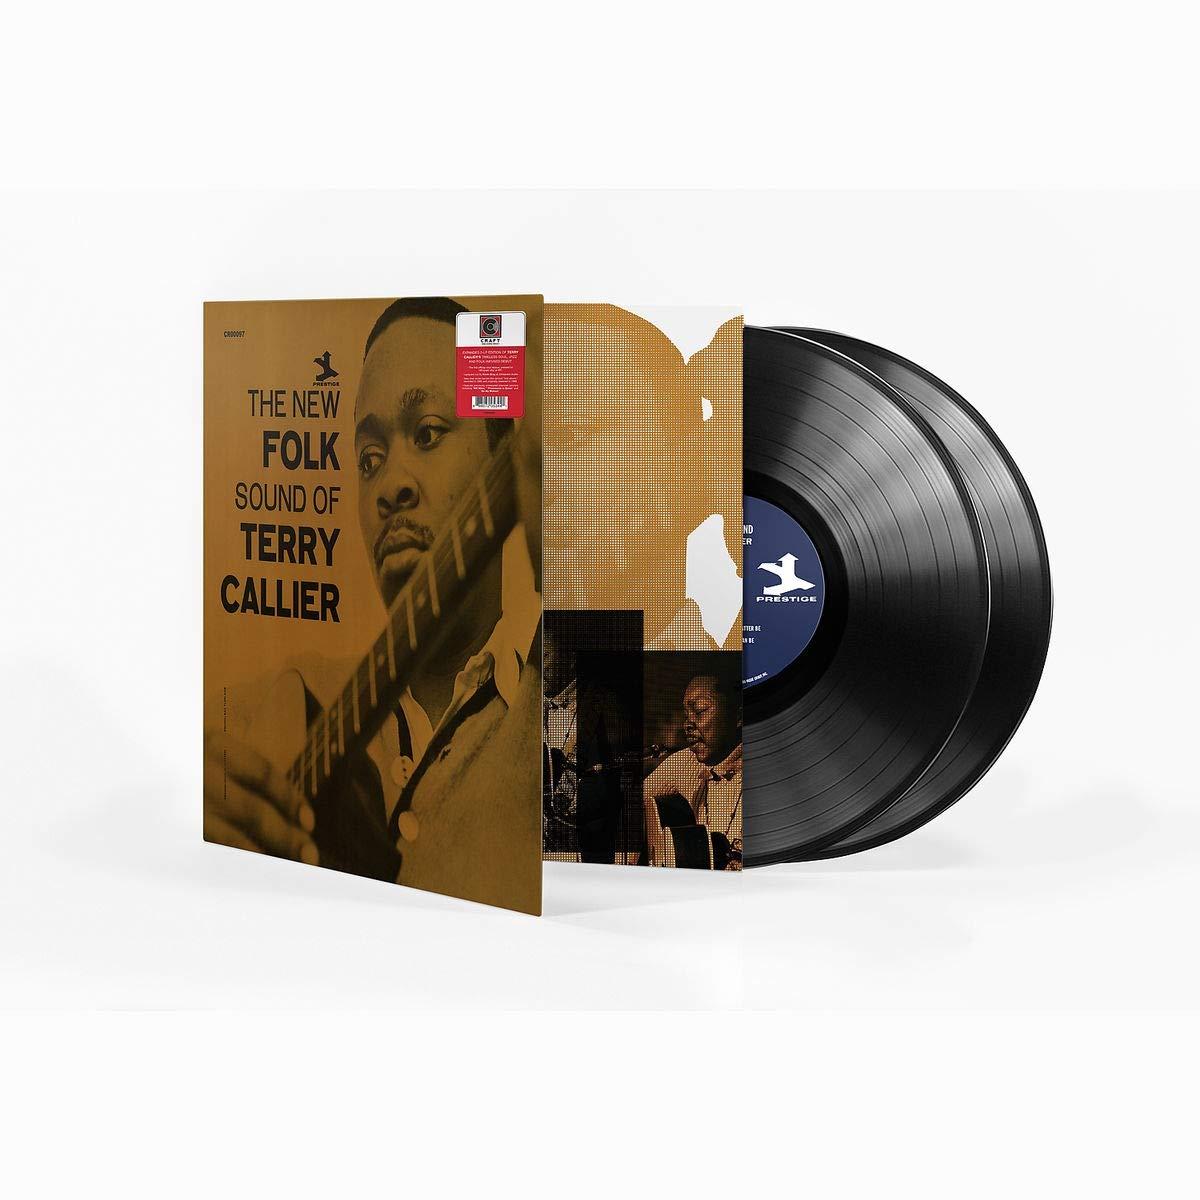 Vinilo : Terry Callier - The New Folk Sound (180 Gram Vinyl, Deluxe Edition)